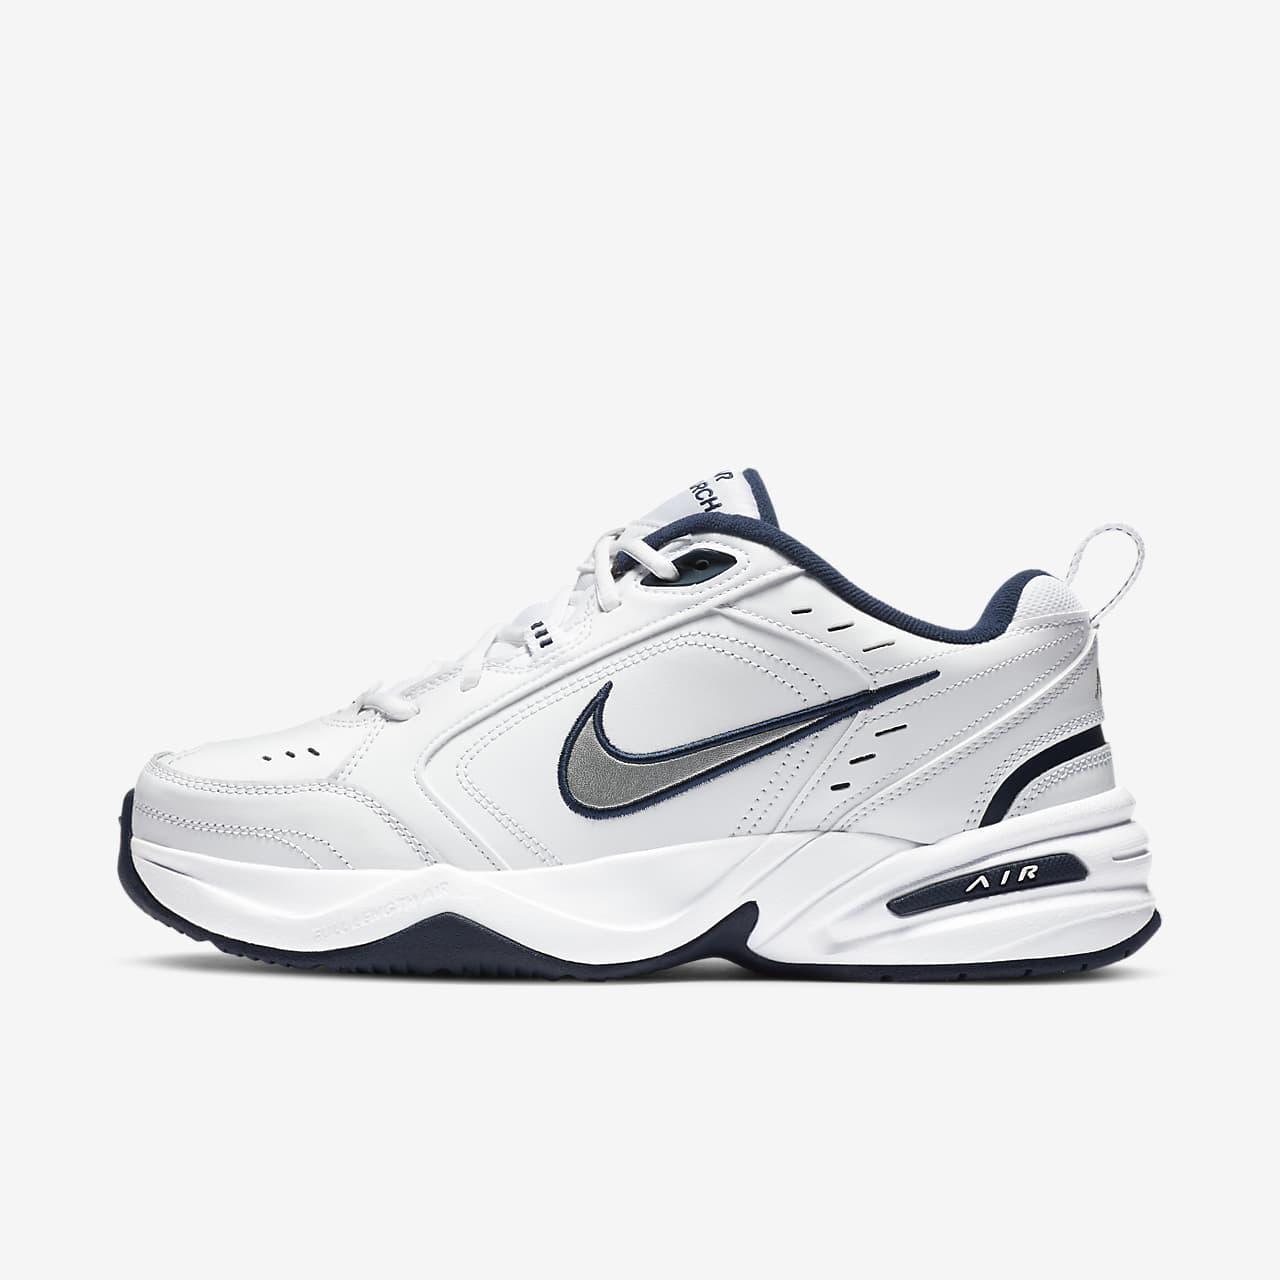 ad992e94b Buty lifestylowe i na siłownię Nike Air Monarch IV. Nike.com PL